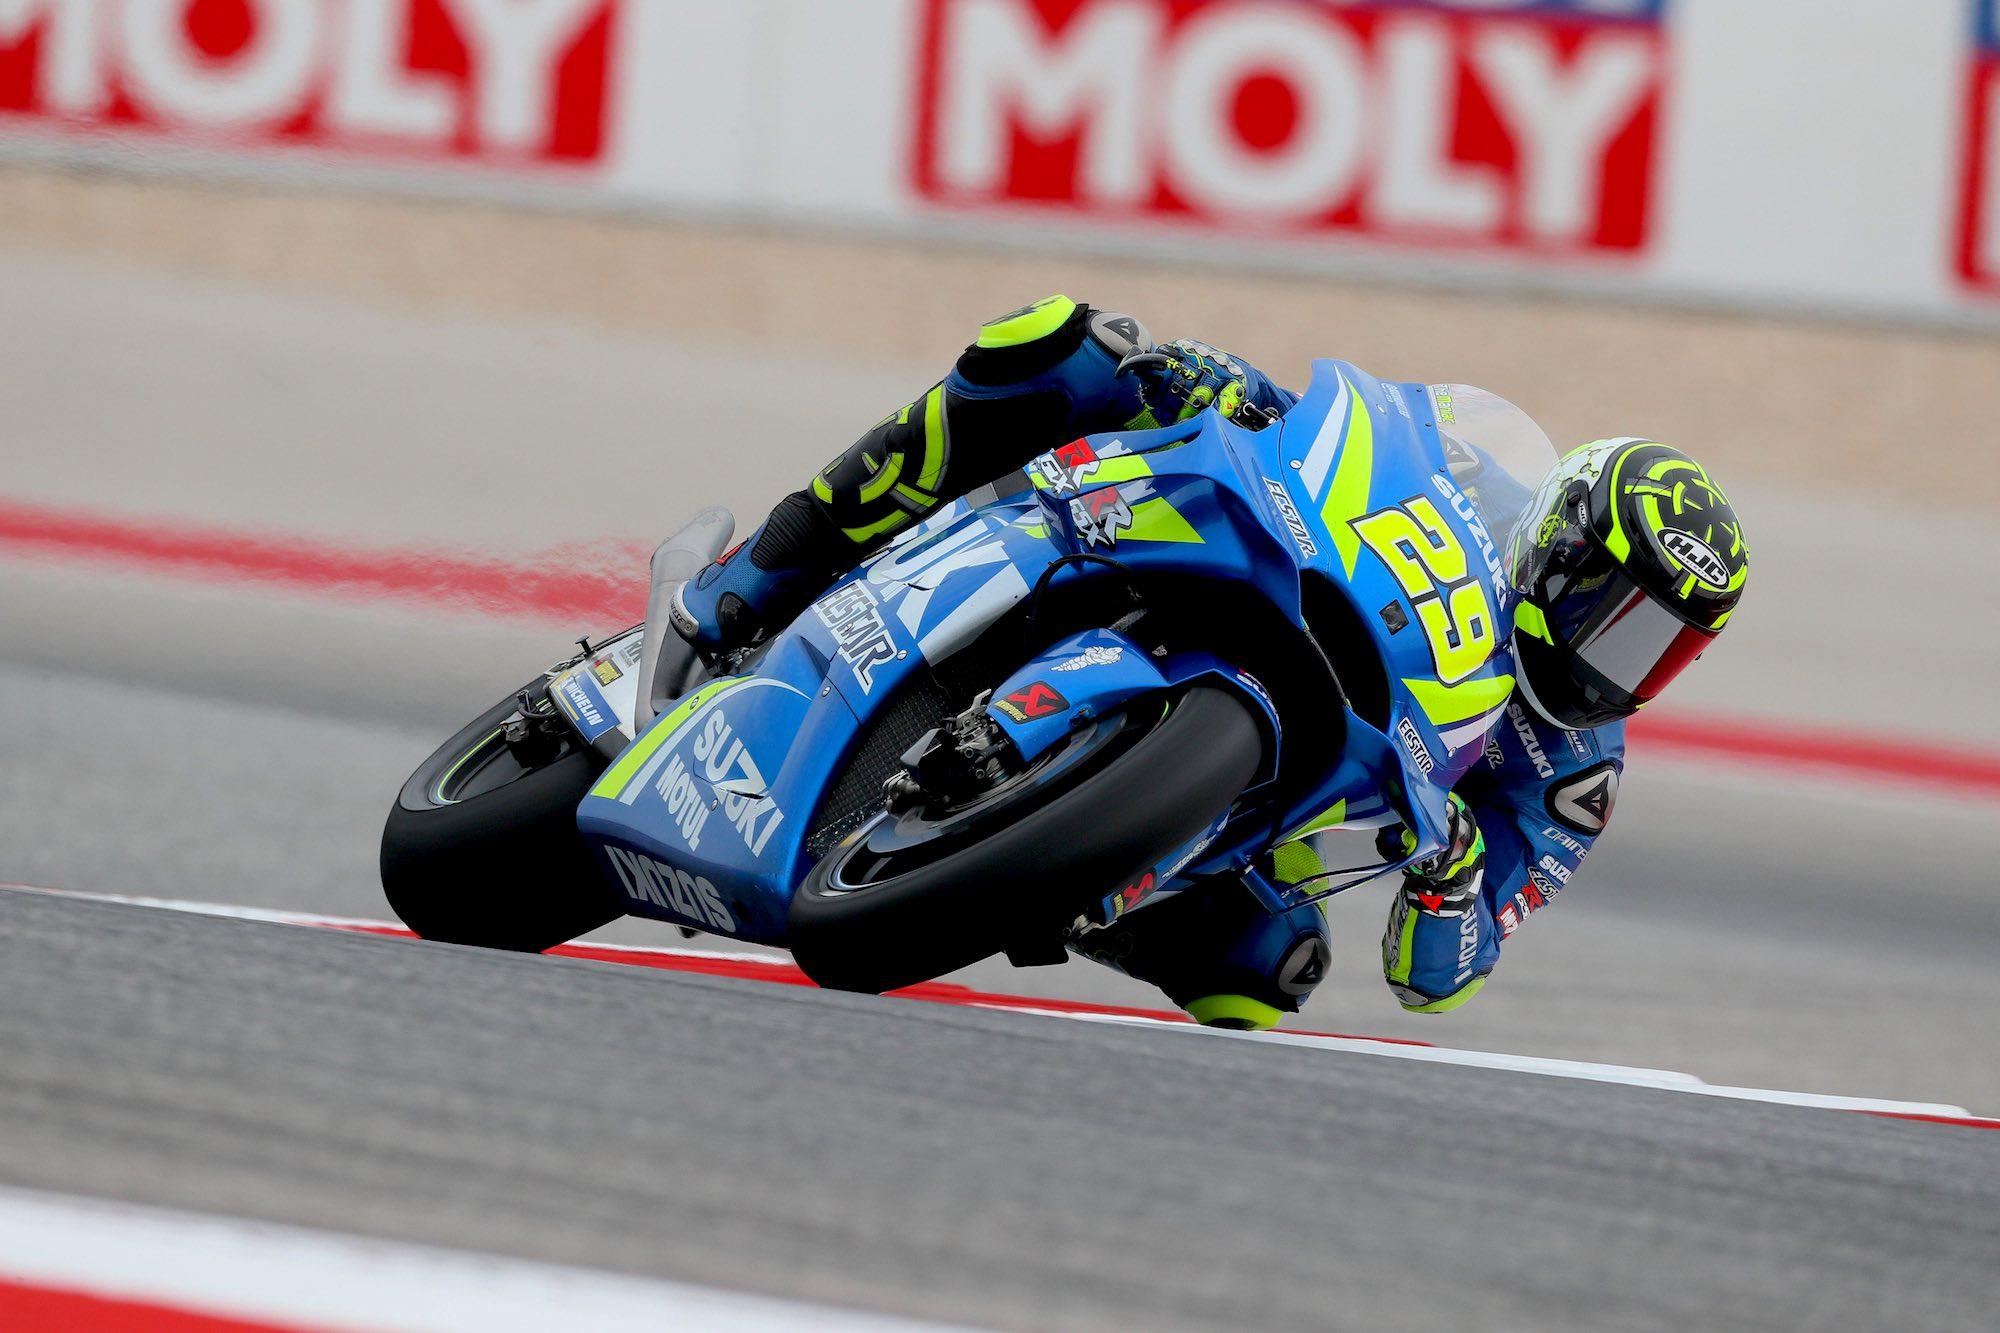 Andrea Iannone golpea primero en MotoGP Austin 2018